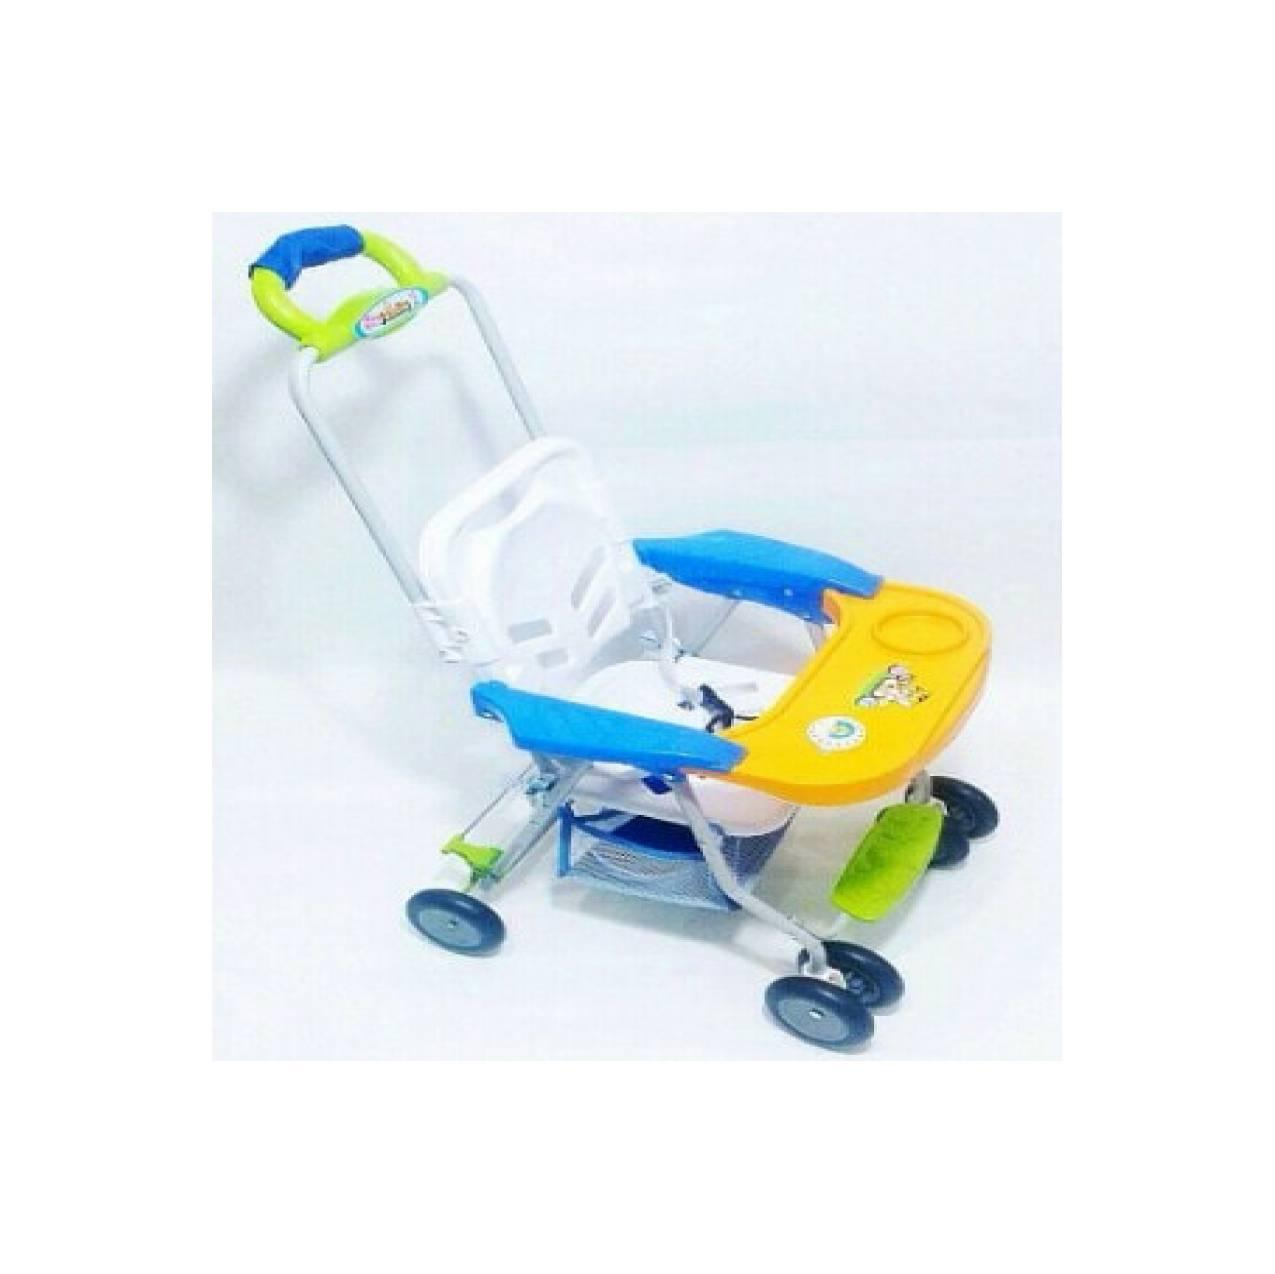 Kursi Dorong Roda Kereta Meja Makan Bayi Family Stroller Baby Chair